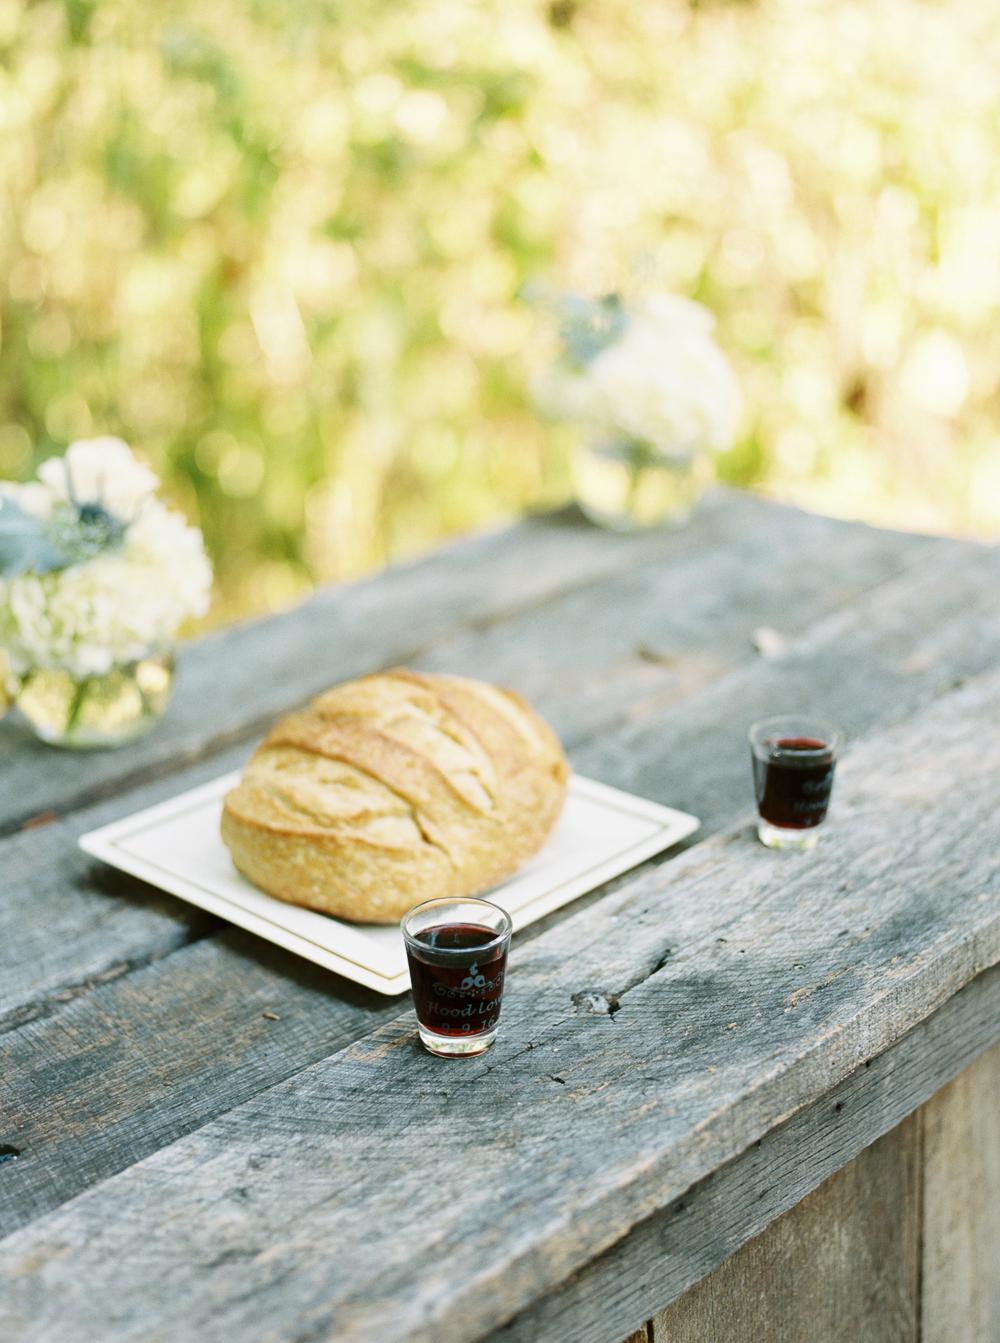 jamie+trey_wrens nest film wedding photographers natural light ©2016abigailbobophotography-18.jpg